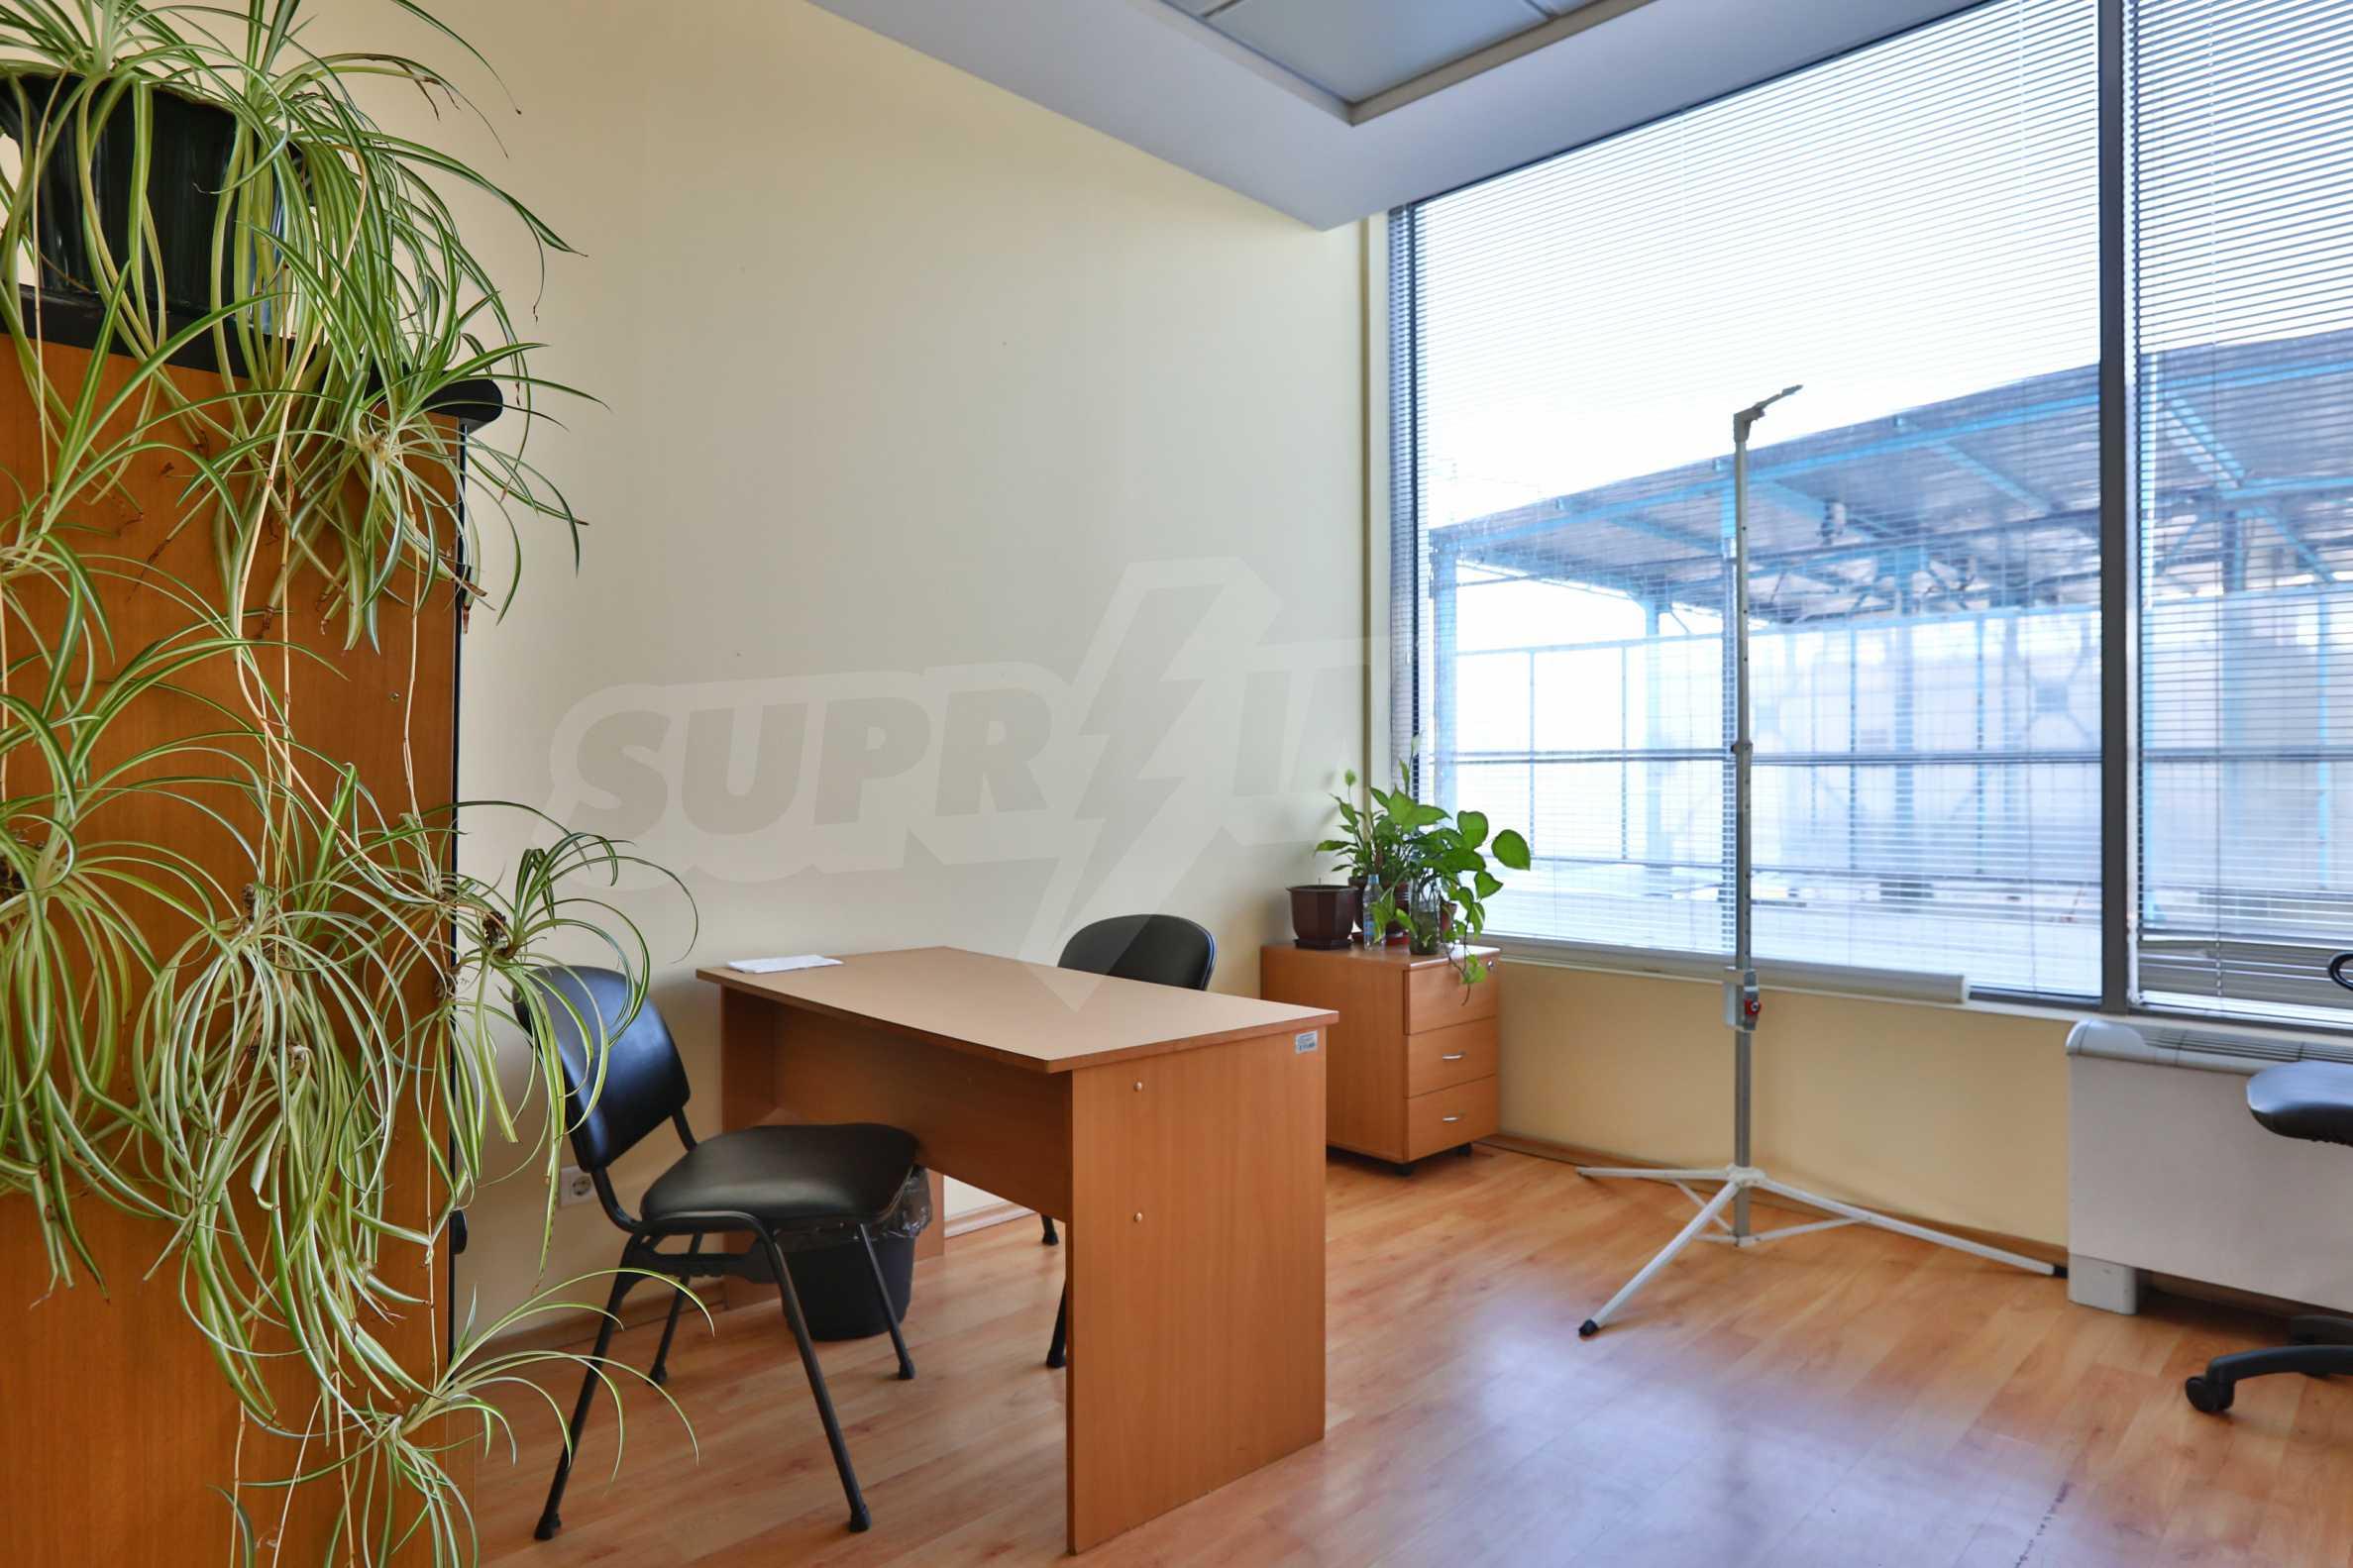 Офис в бизнес сграда висок клас на бул. Цариградско шосе 5